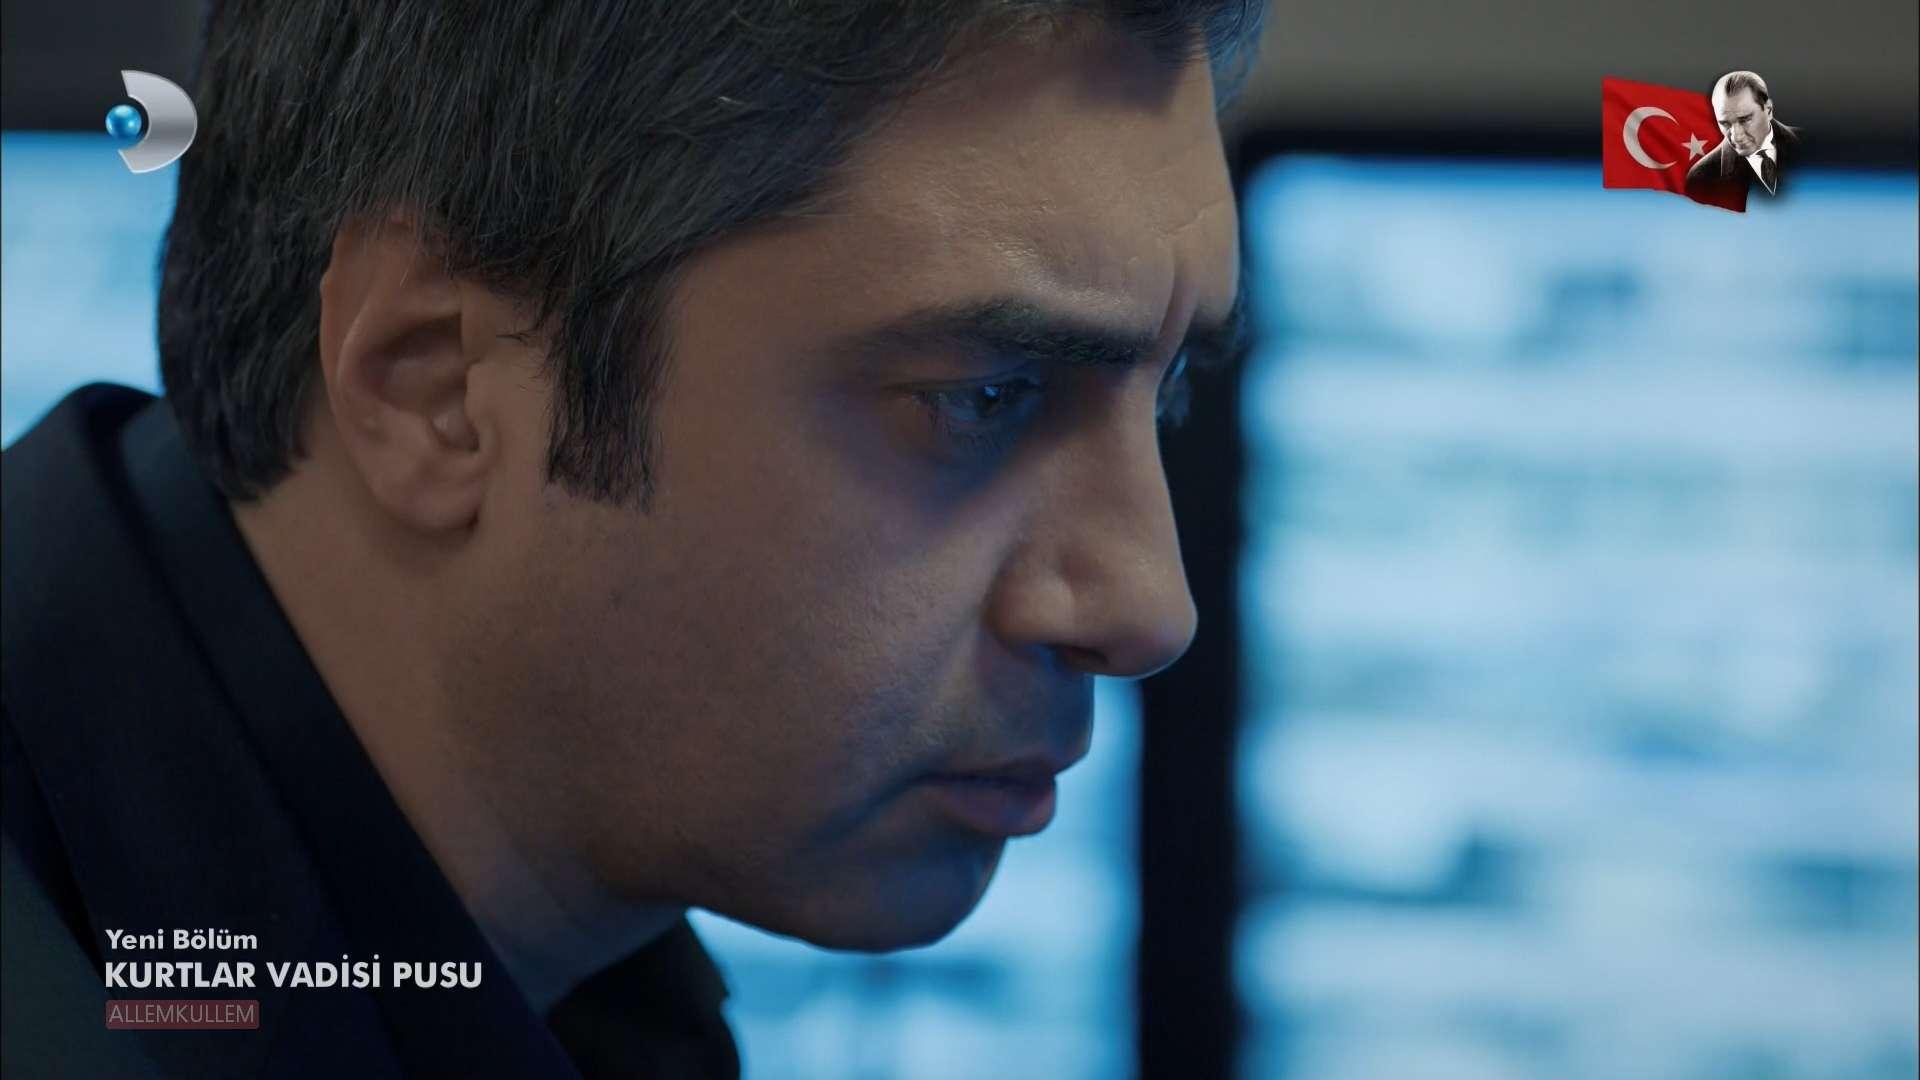 Kurtlar Vadisi Pusu 269.Bölüm (29.10.2015) HQ 1080p HDTV FuLLHD